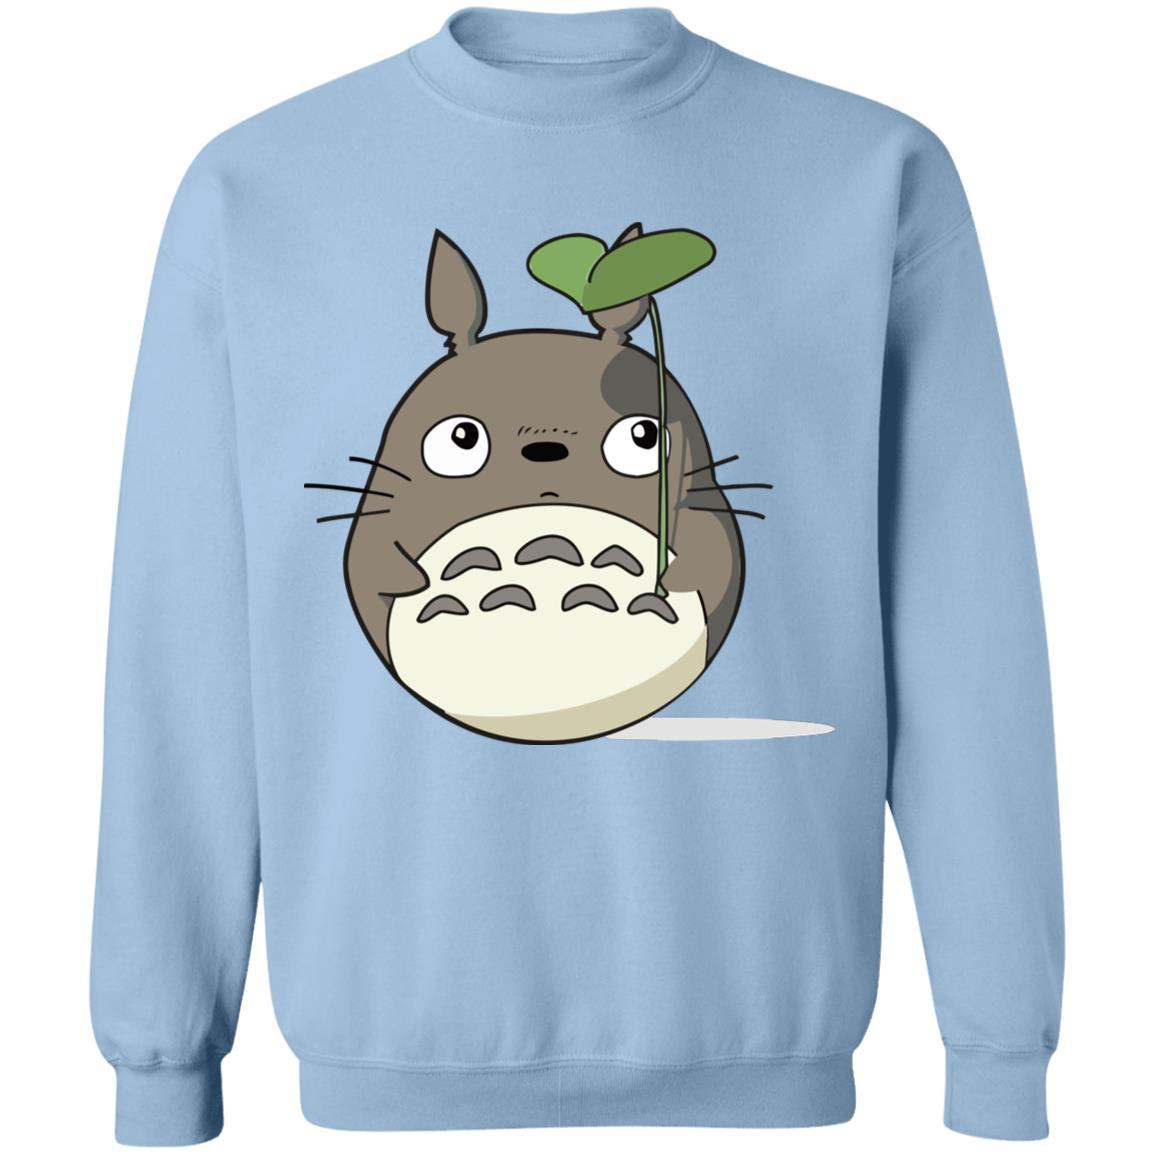 Totoro and the Leaf Umbrella Sweatshirt